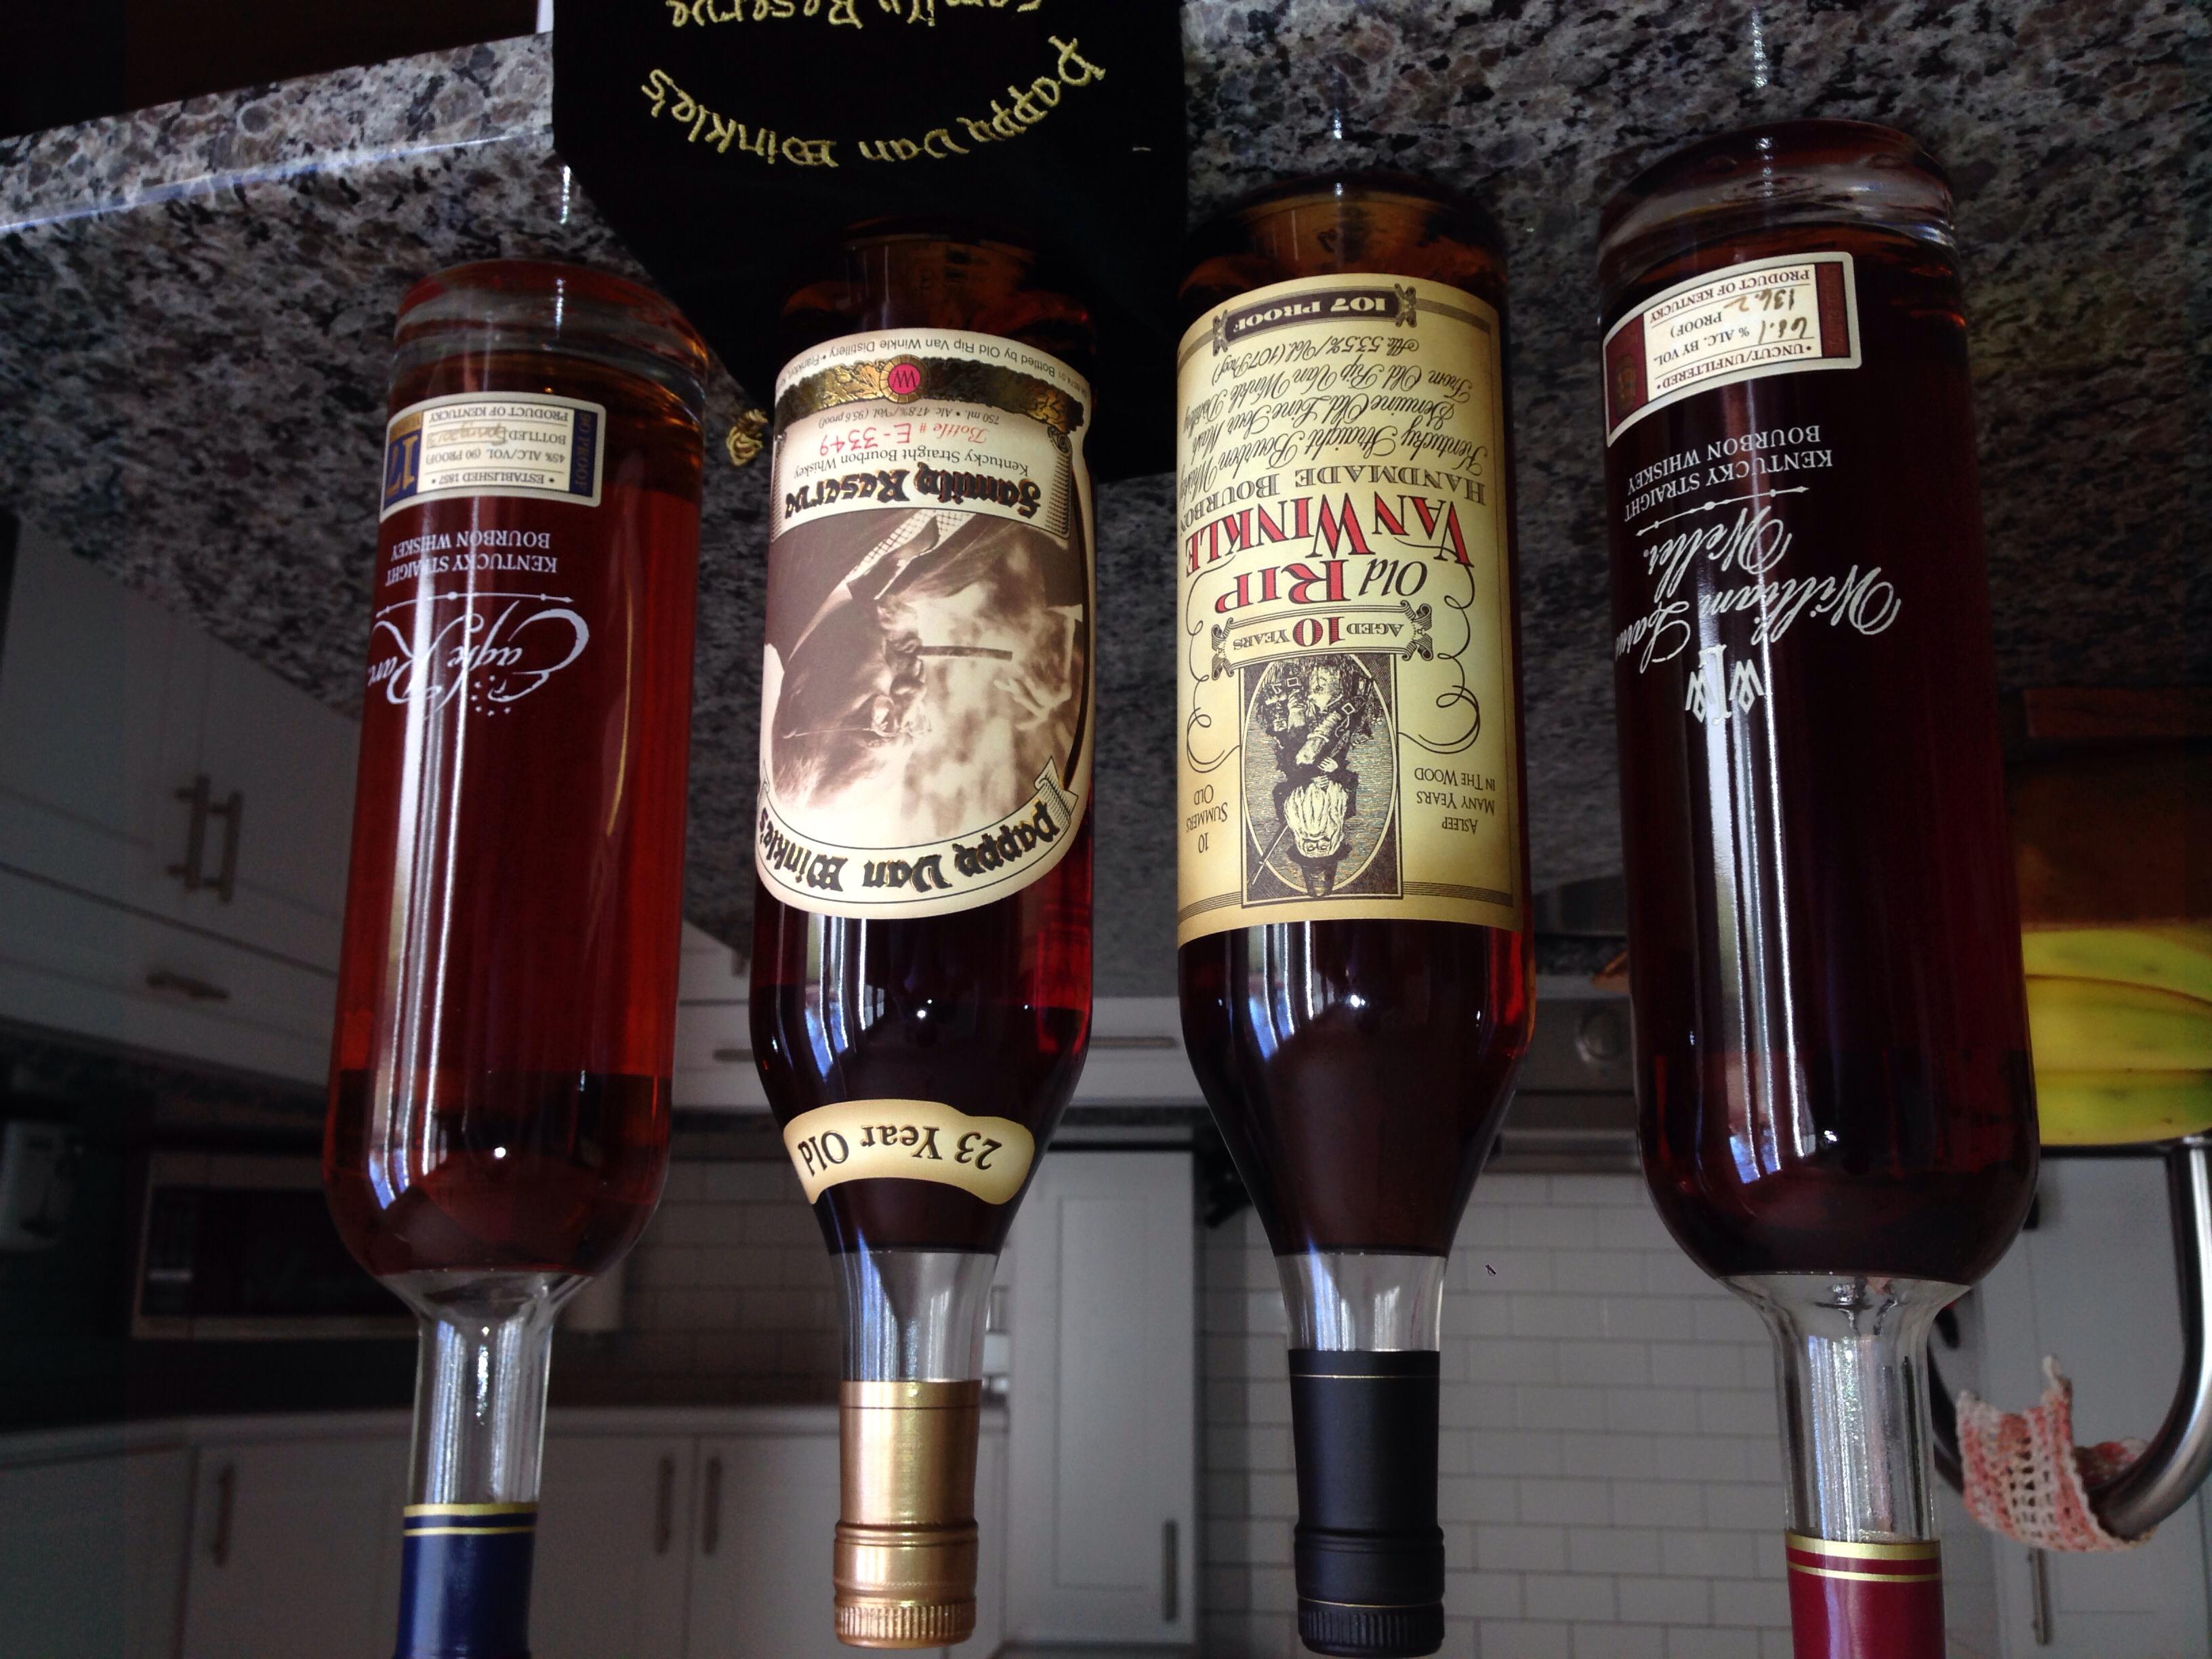 Prichard S Double Chocolate Bourbon Review